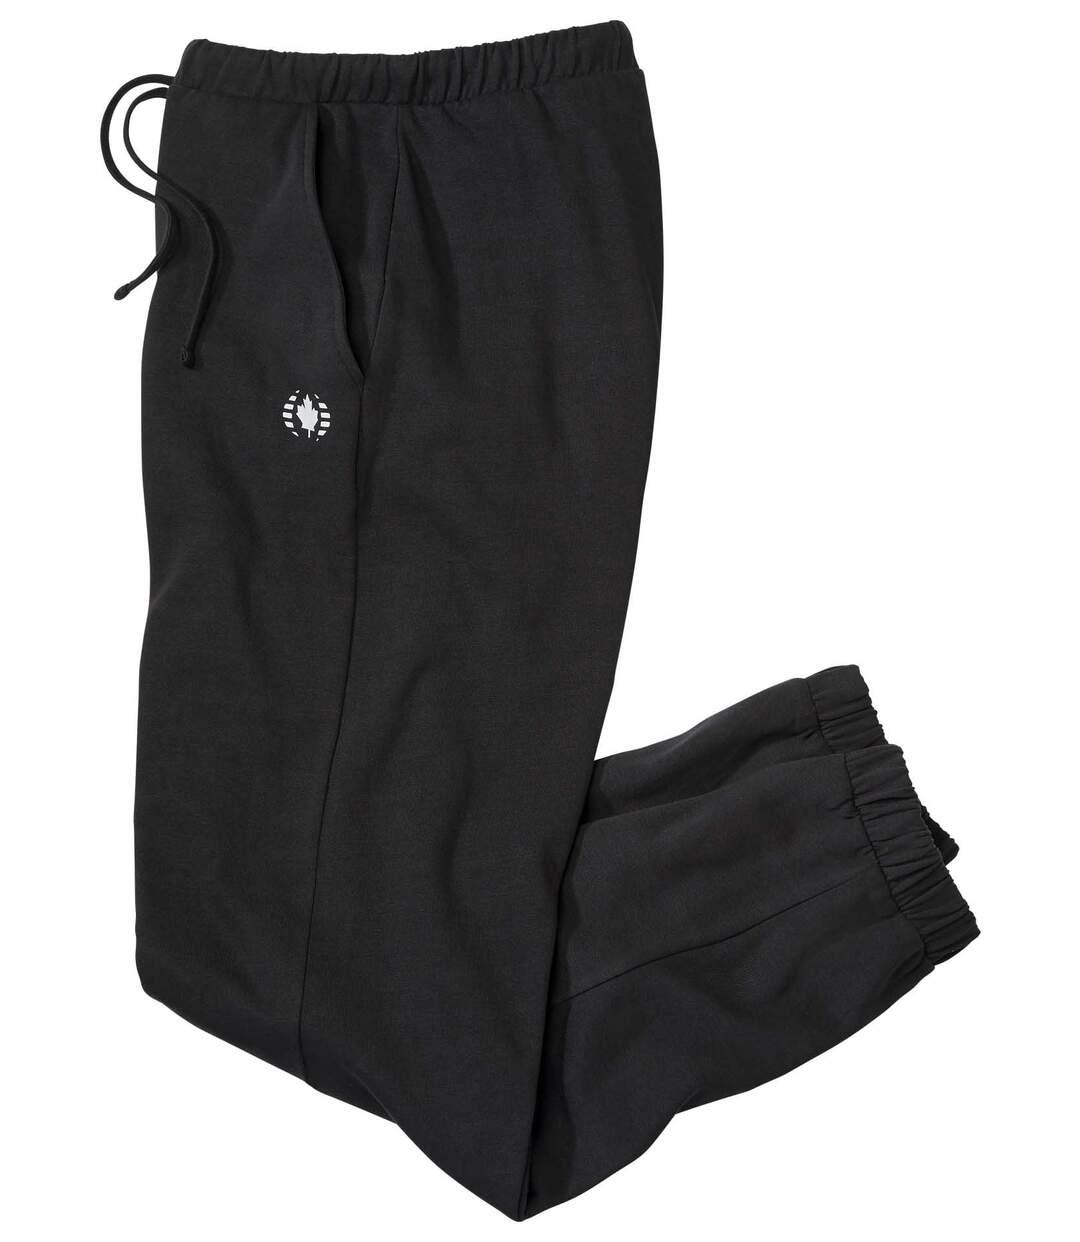 Men's Black Sporty Brushed Fleece Joggers